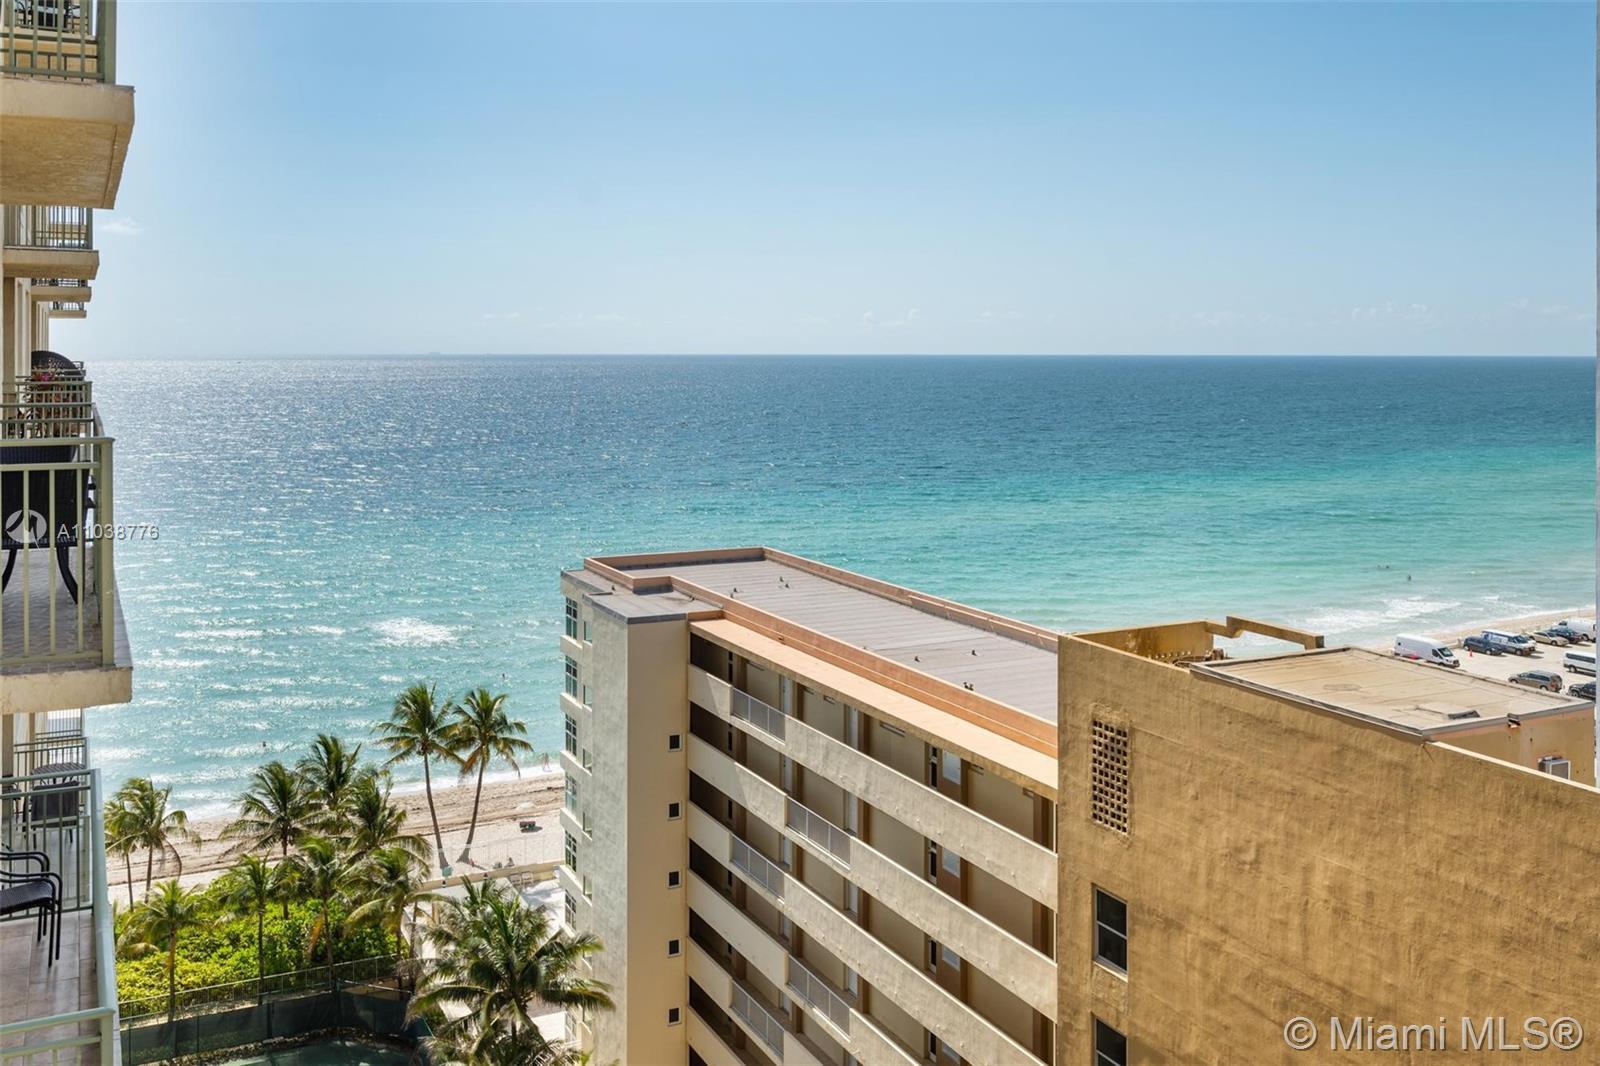 2080 Hallandale #1203 - 2080 S Ocean Dr #1203, Hallandale Beach, FL 33009